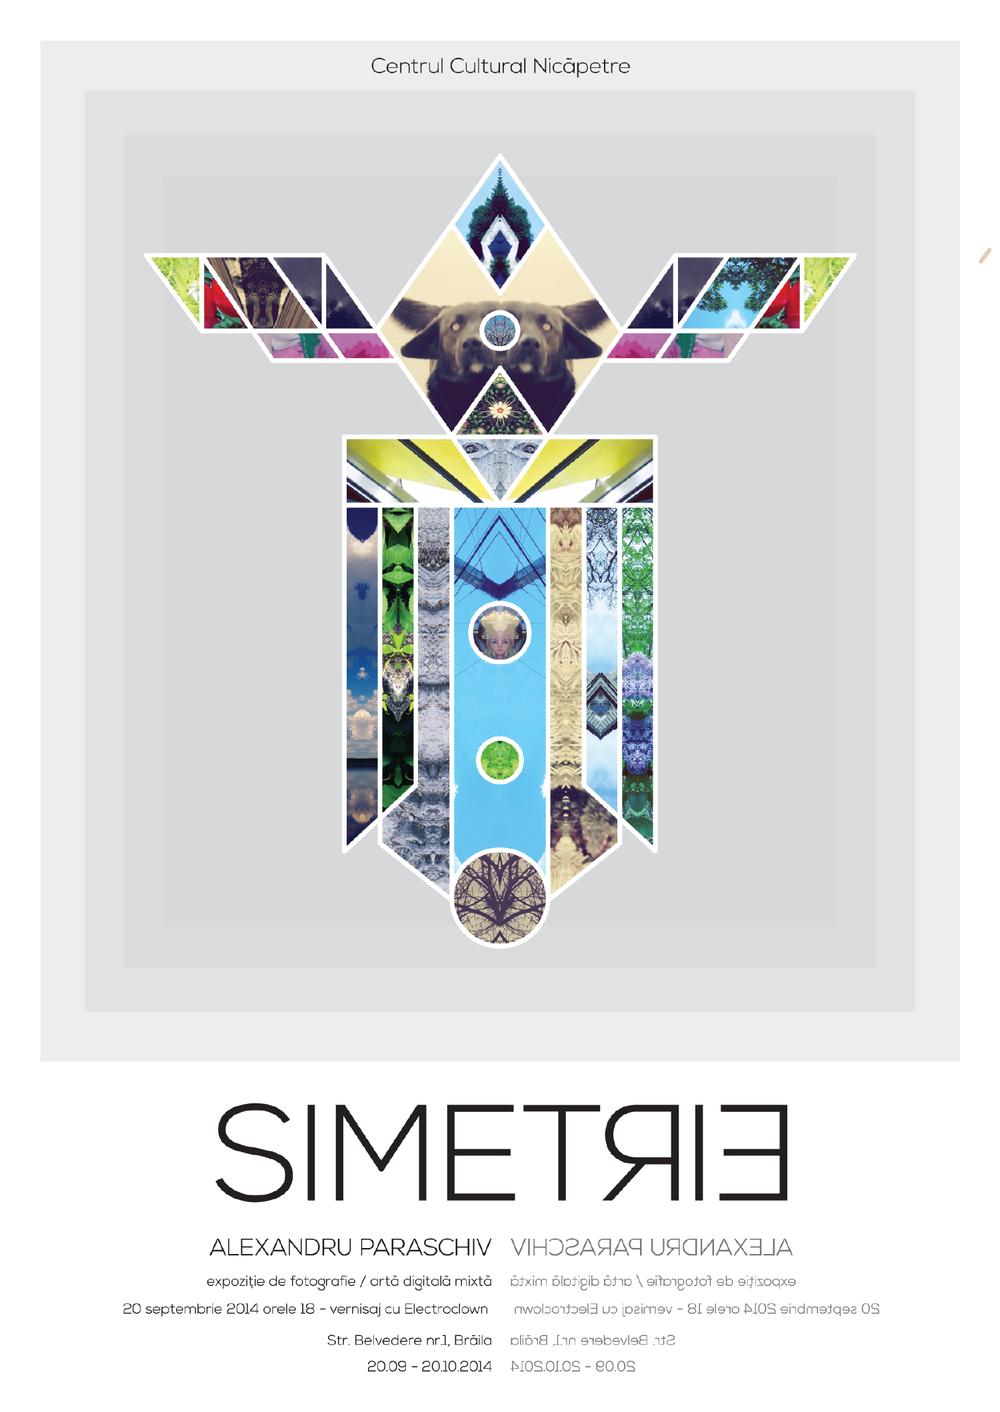 simetrie-01.png